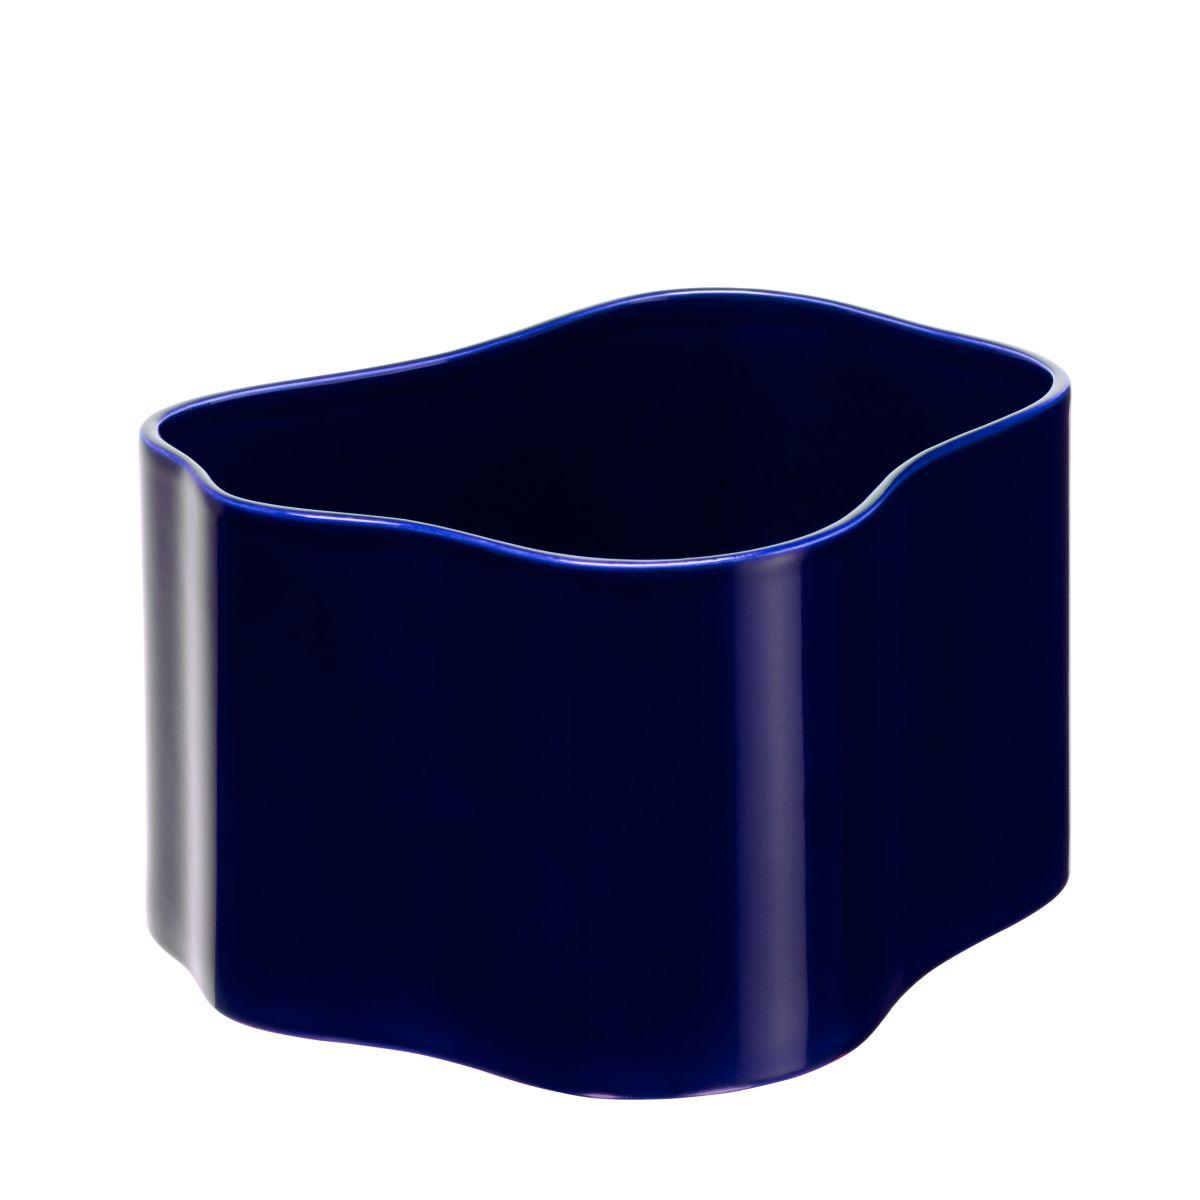 Plant-Pot-Shape-B-Size-M-Blue-Gloss_F